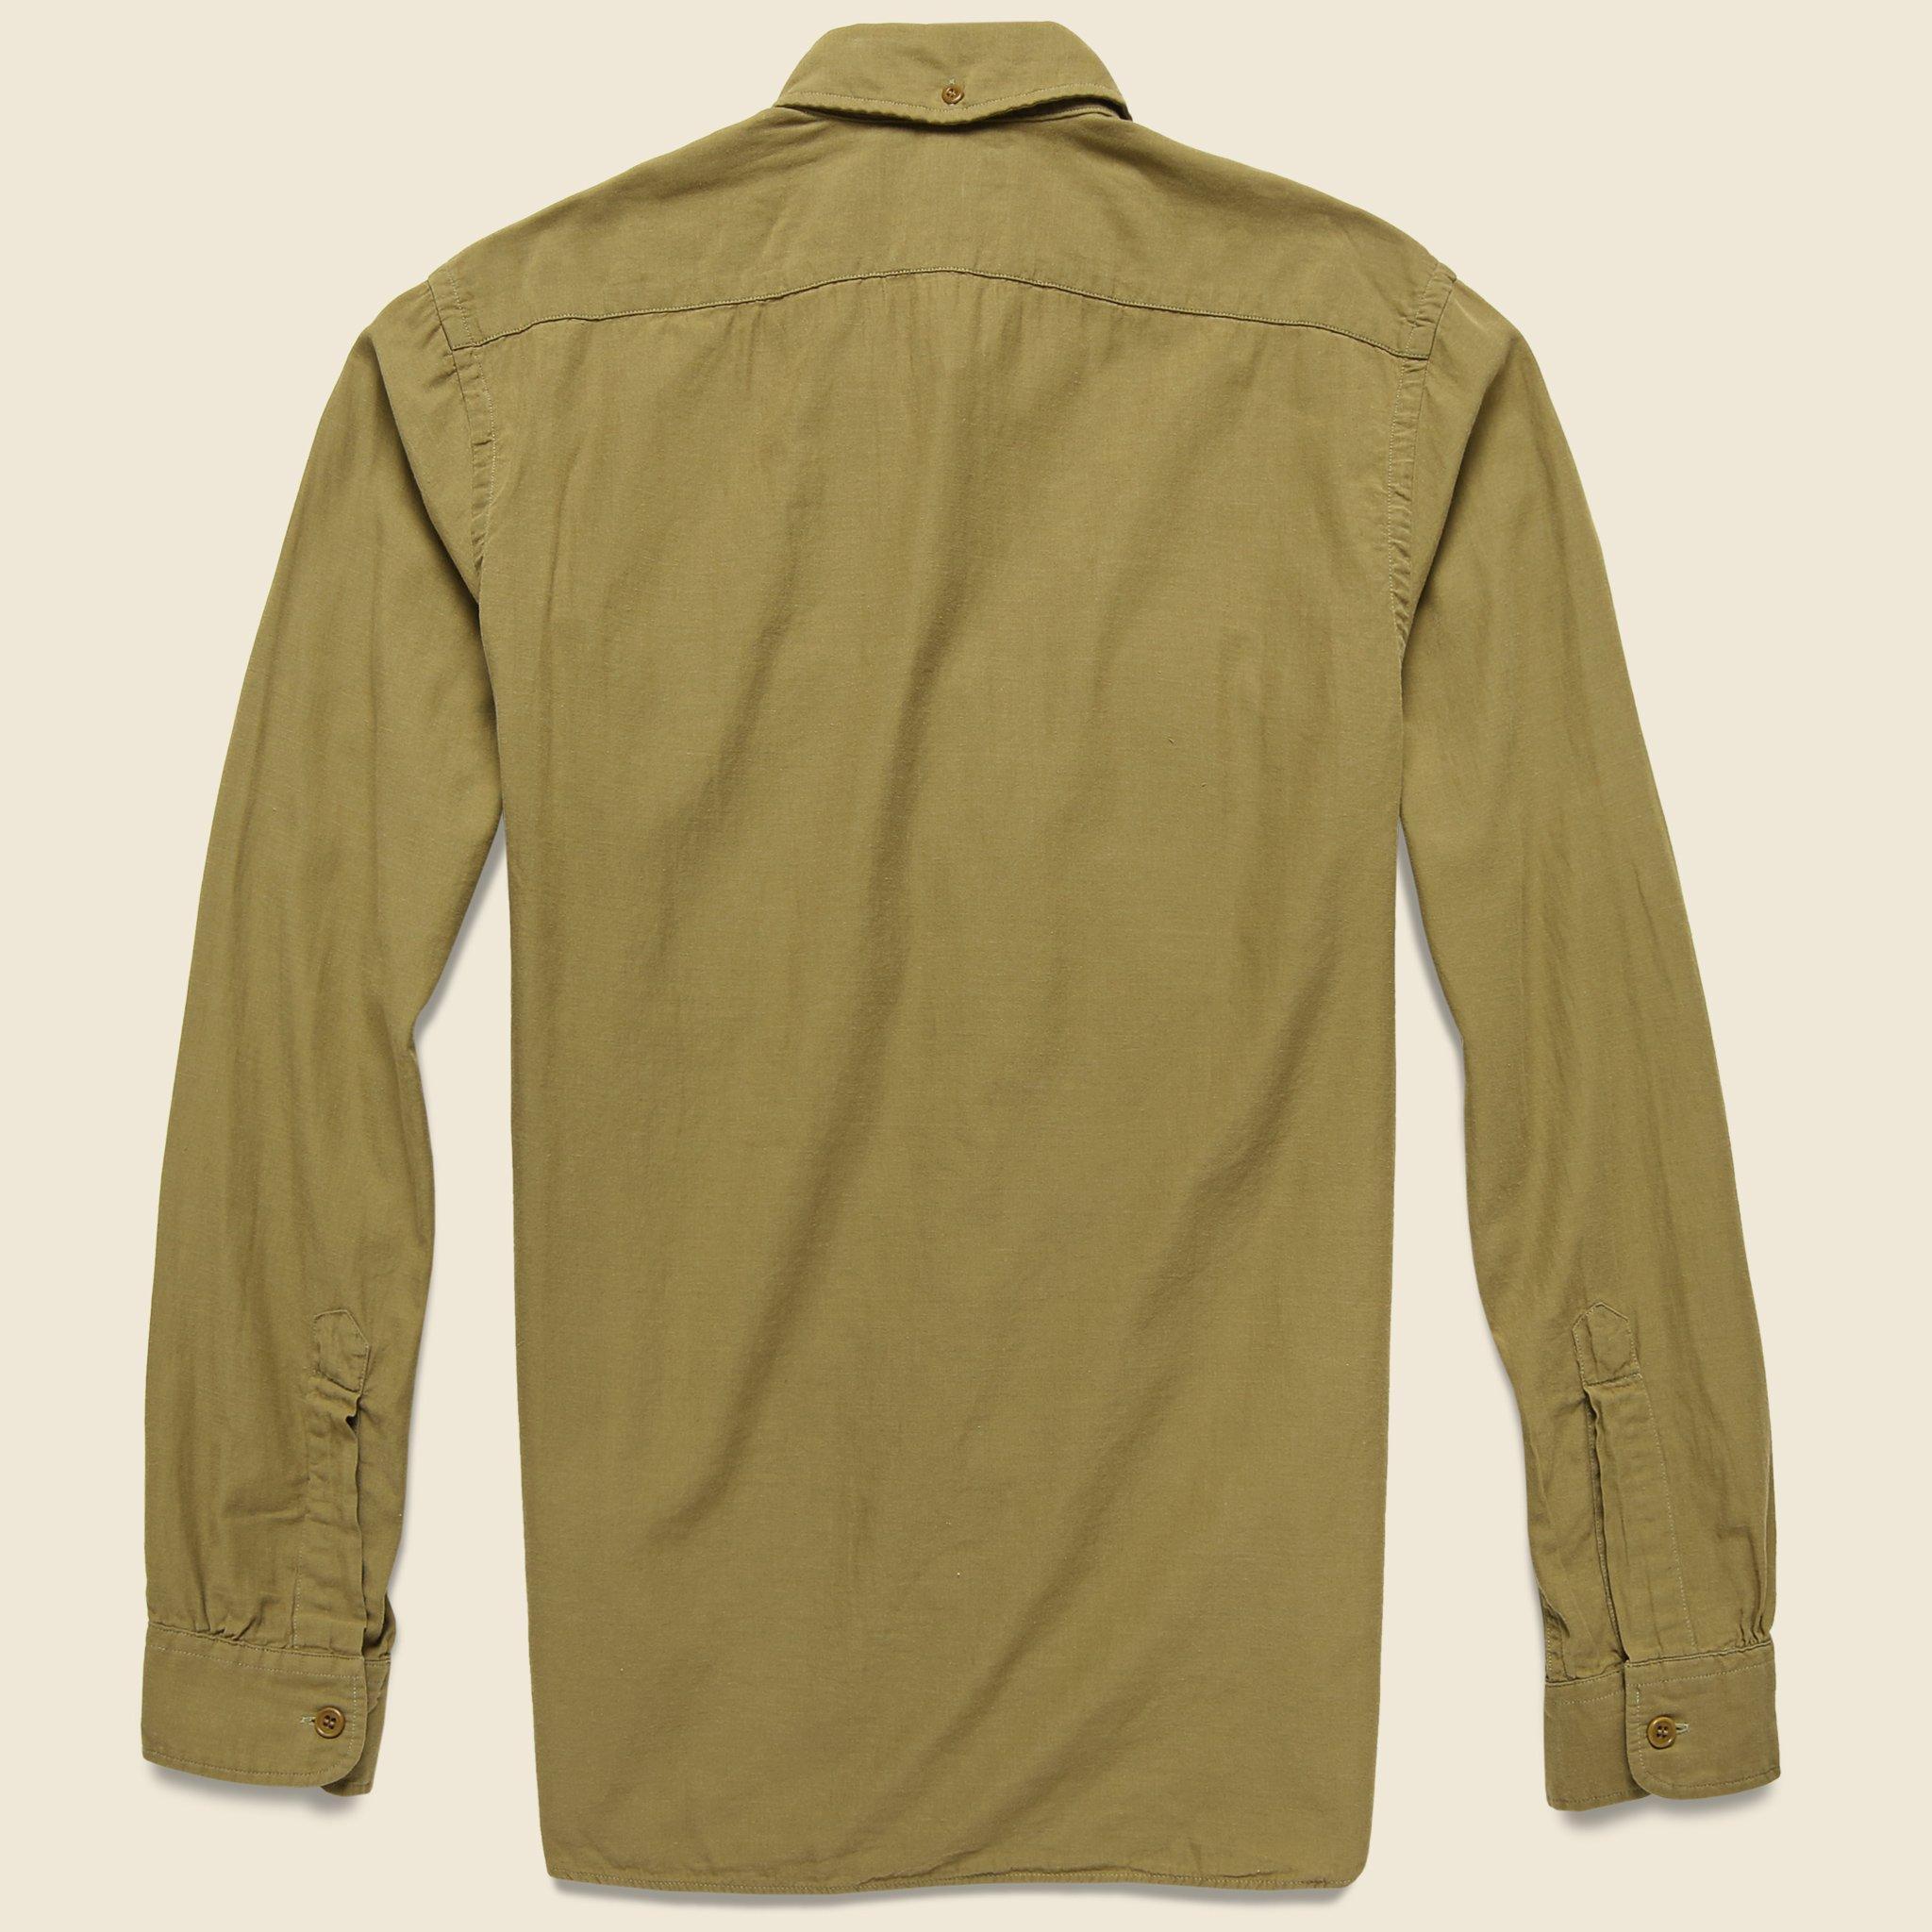 b0c1ac34 RRL Clayton Sateen Military Shirt - Desert Tan in Green for Men - Lyst